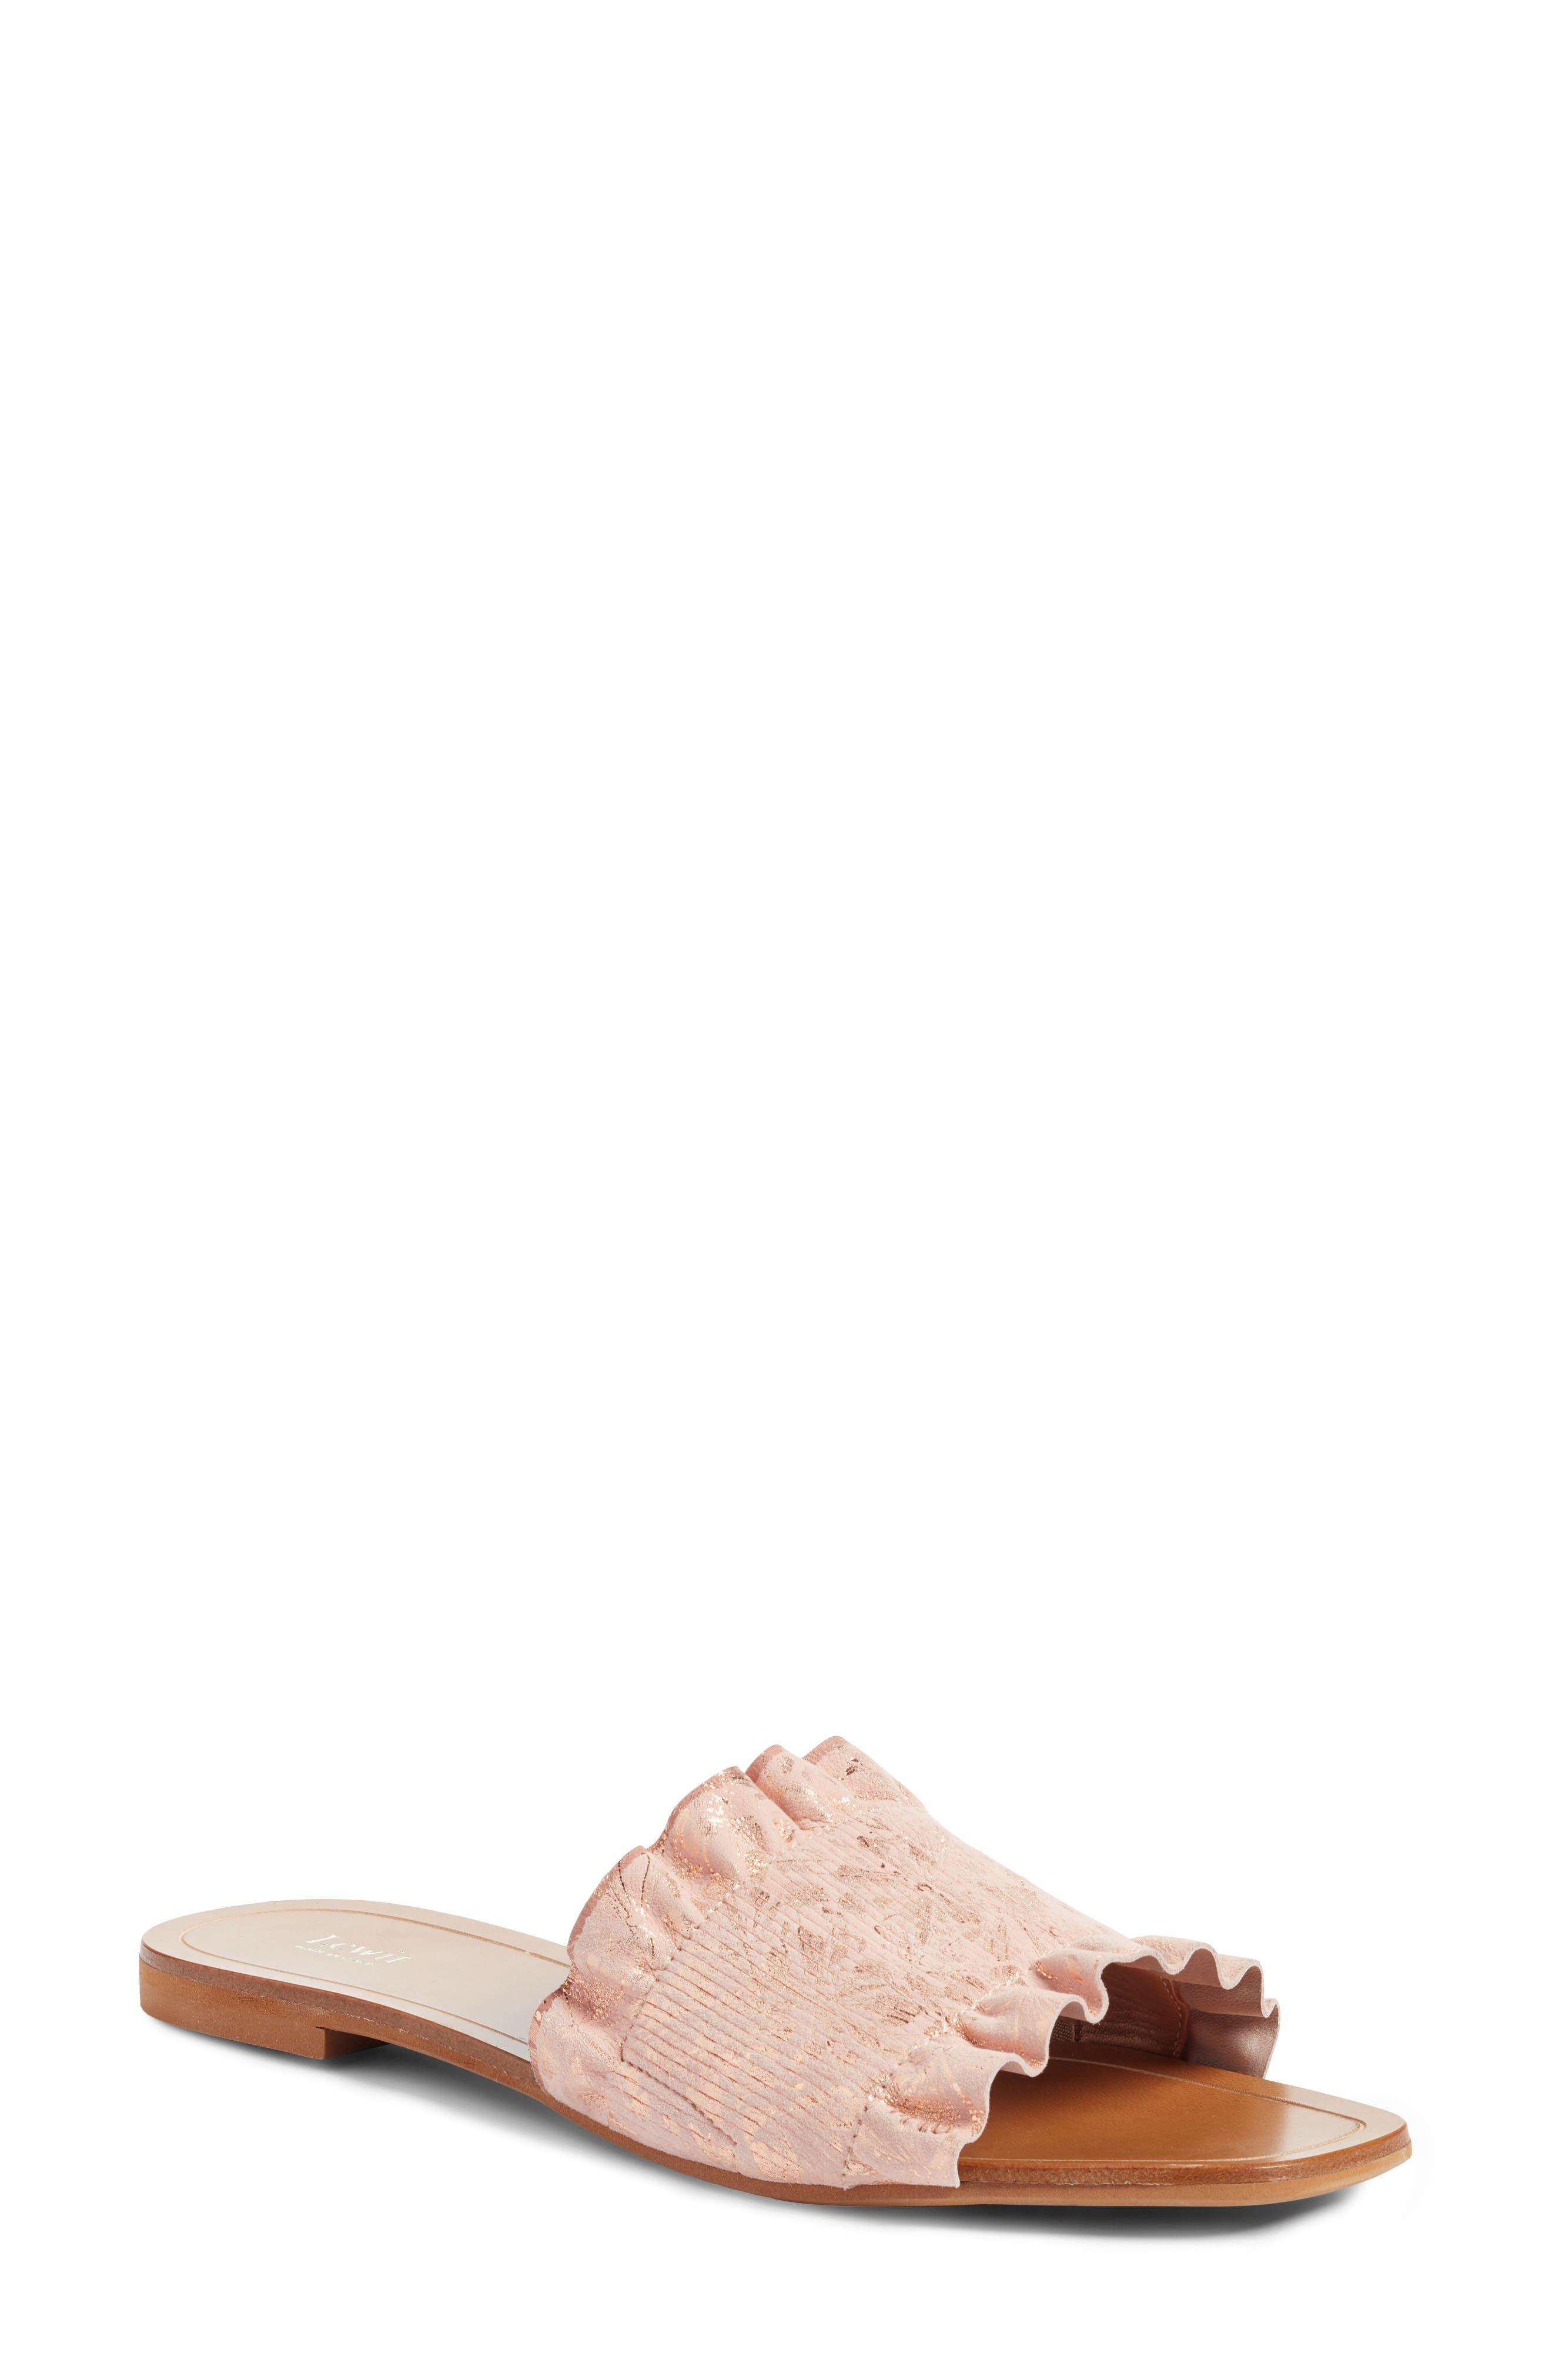 Cassandra Ruffle Slide Sandal,                         Main,                         color, Rose Gold Leather